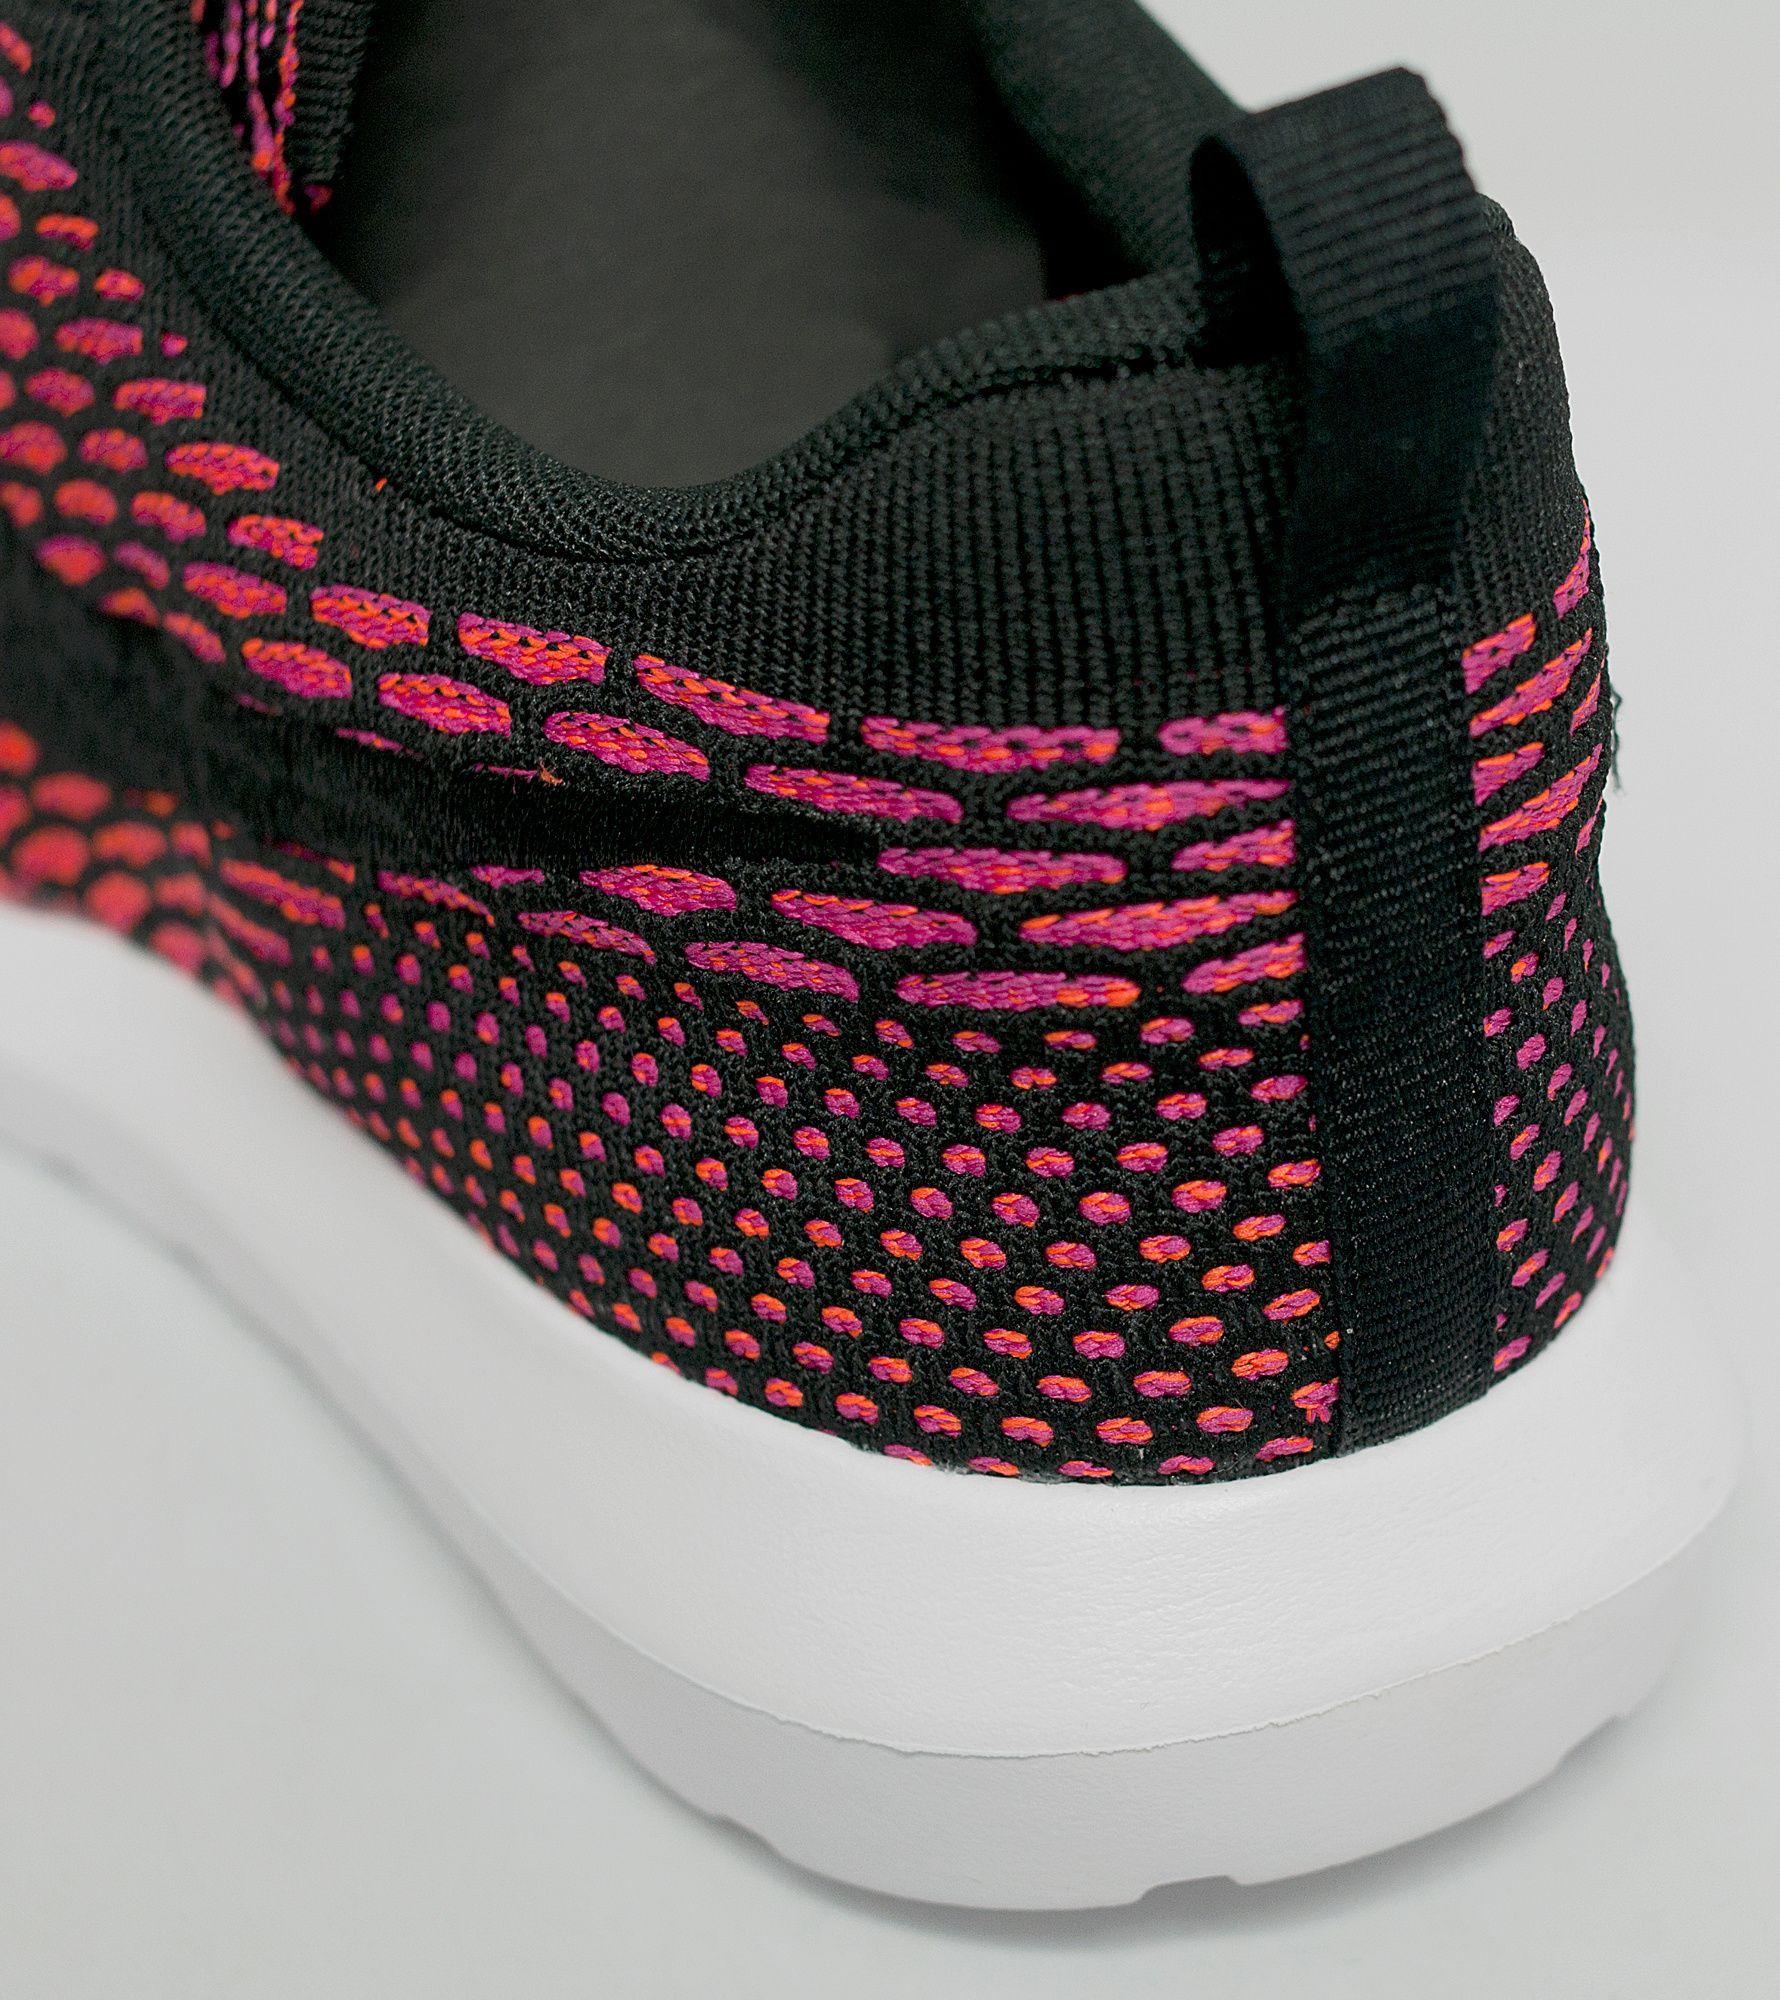 doakd Nike Roshe Run Flyknit \'Fireberry\' | Size?